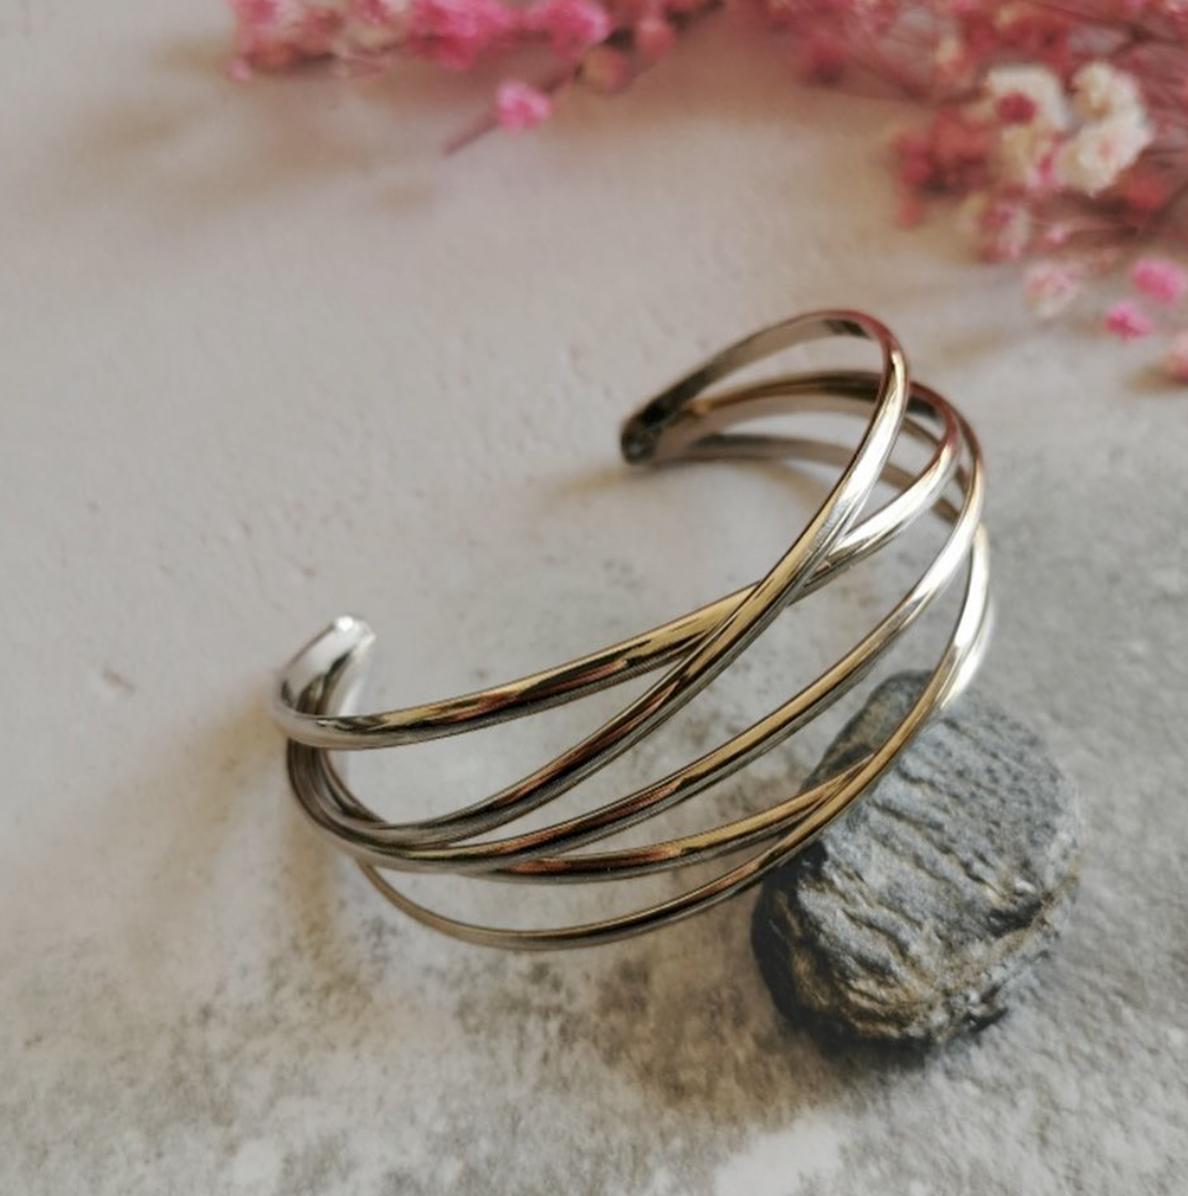 SIlver Tone Bracelet by Emi Jewellery